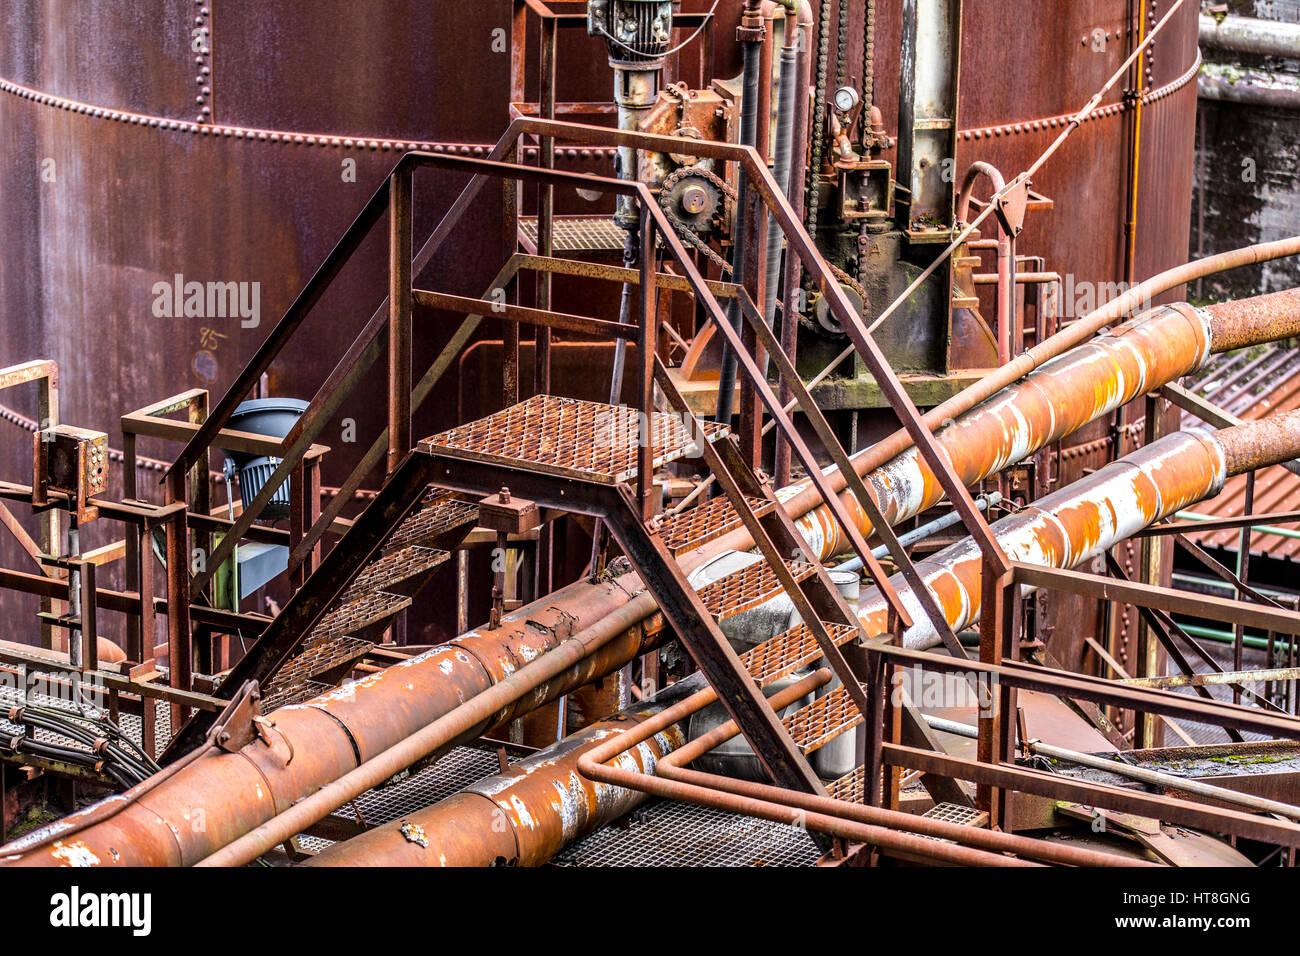 Henrichshütte, former steelworks, industrial museum, blast furnace, Hattingen, Germany, - Stock Image